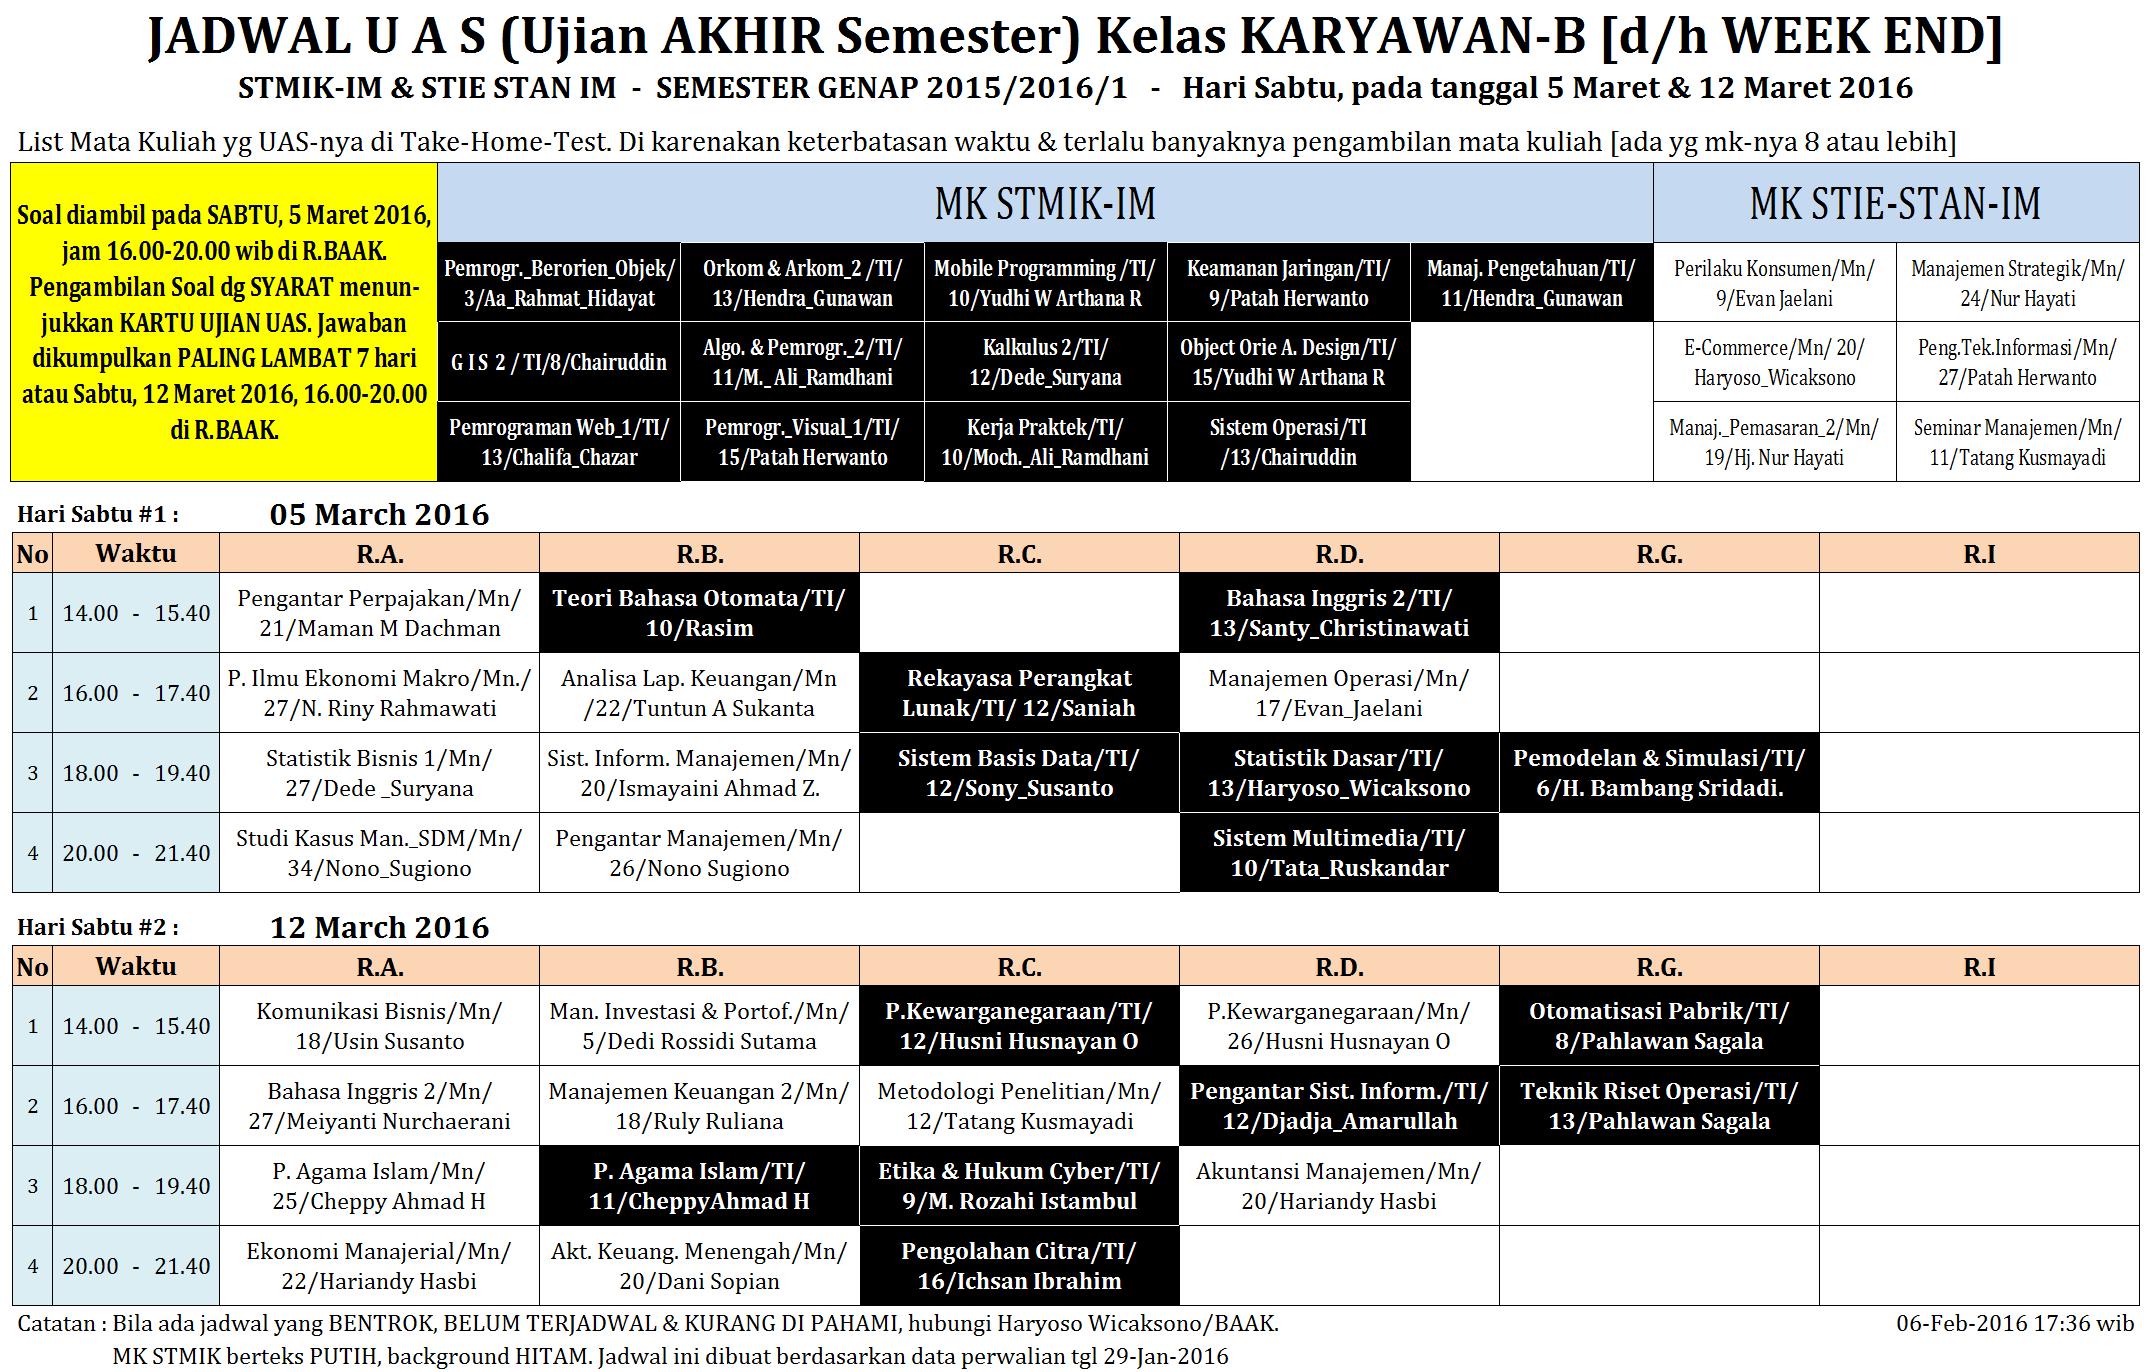 Jadwal UAS KRY-B Mulai 5-Maret-16